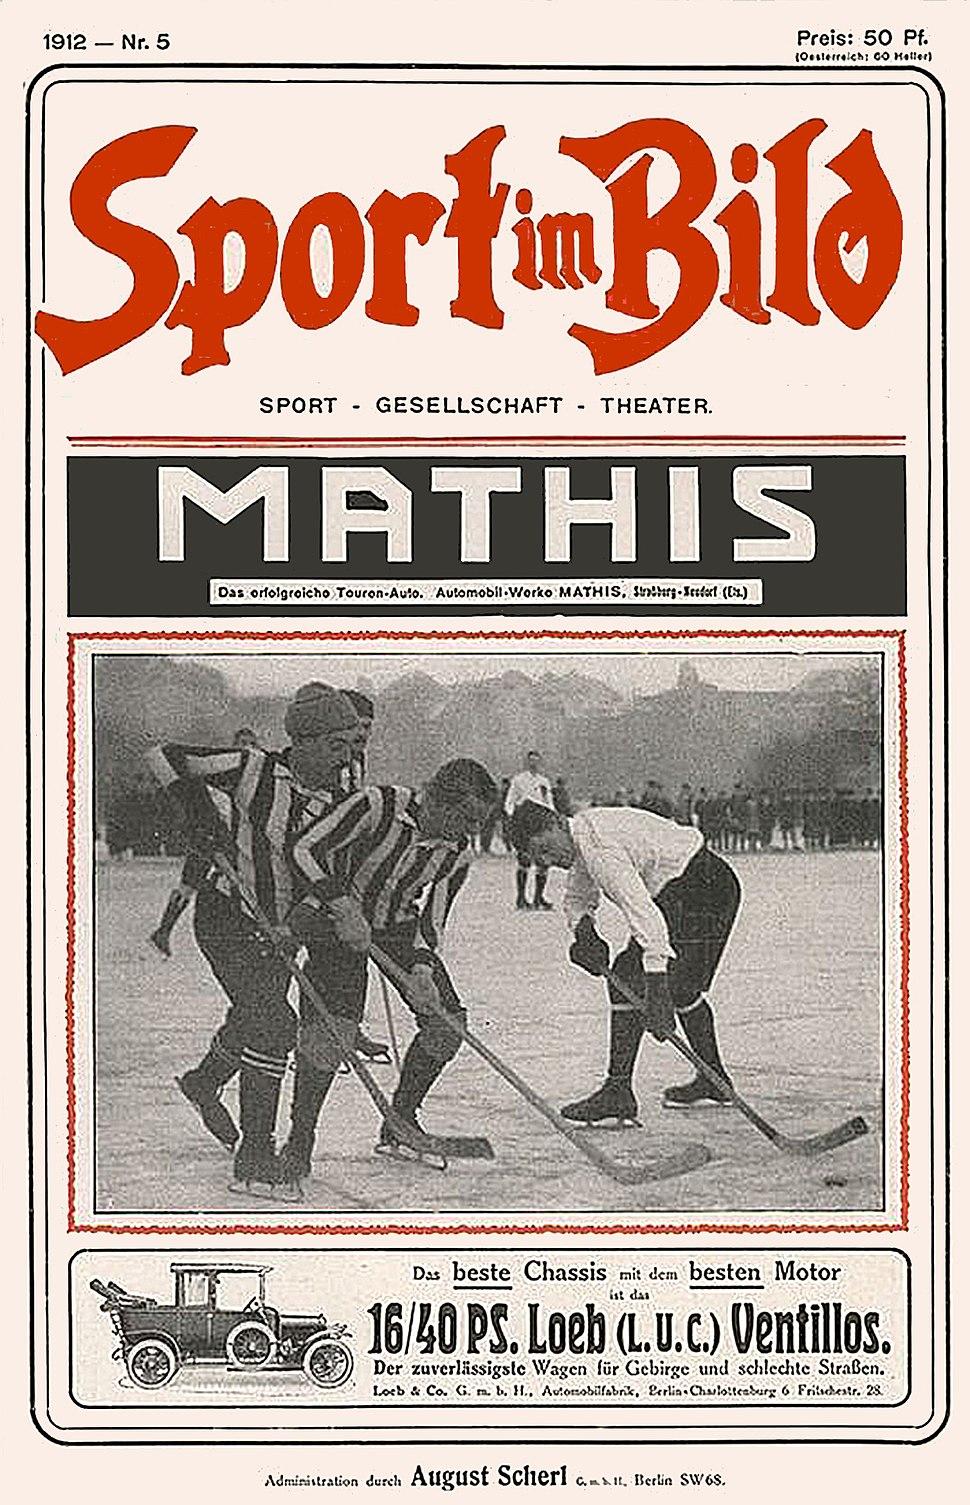 Sport-im-bild-1912-eishockey